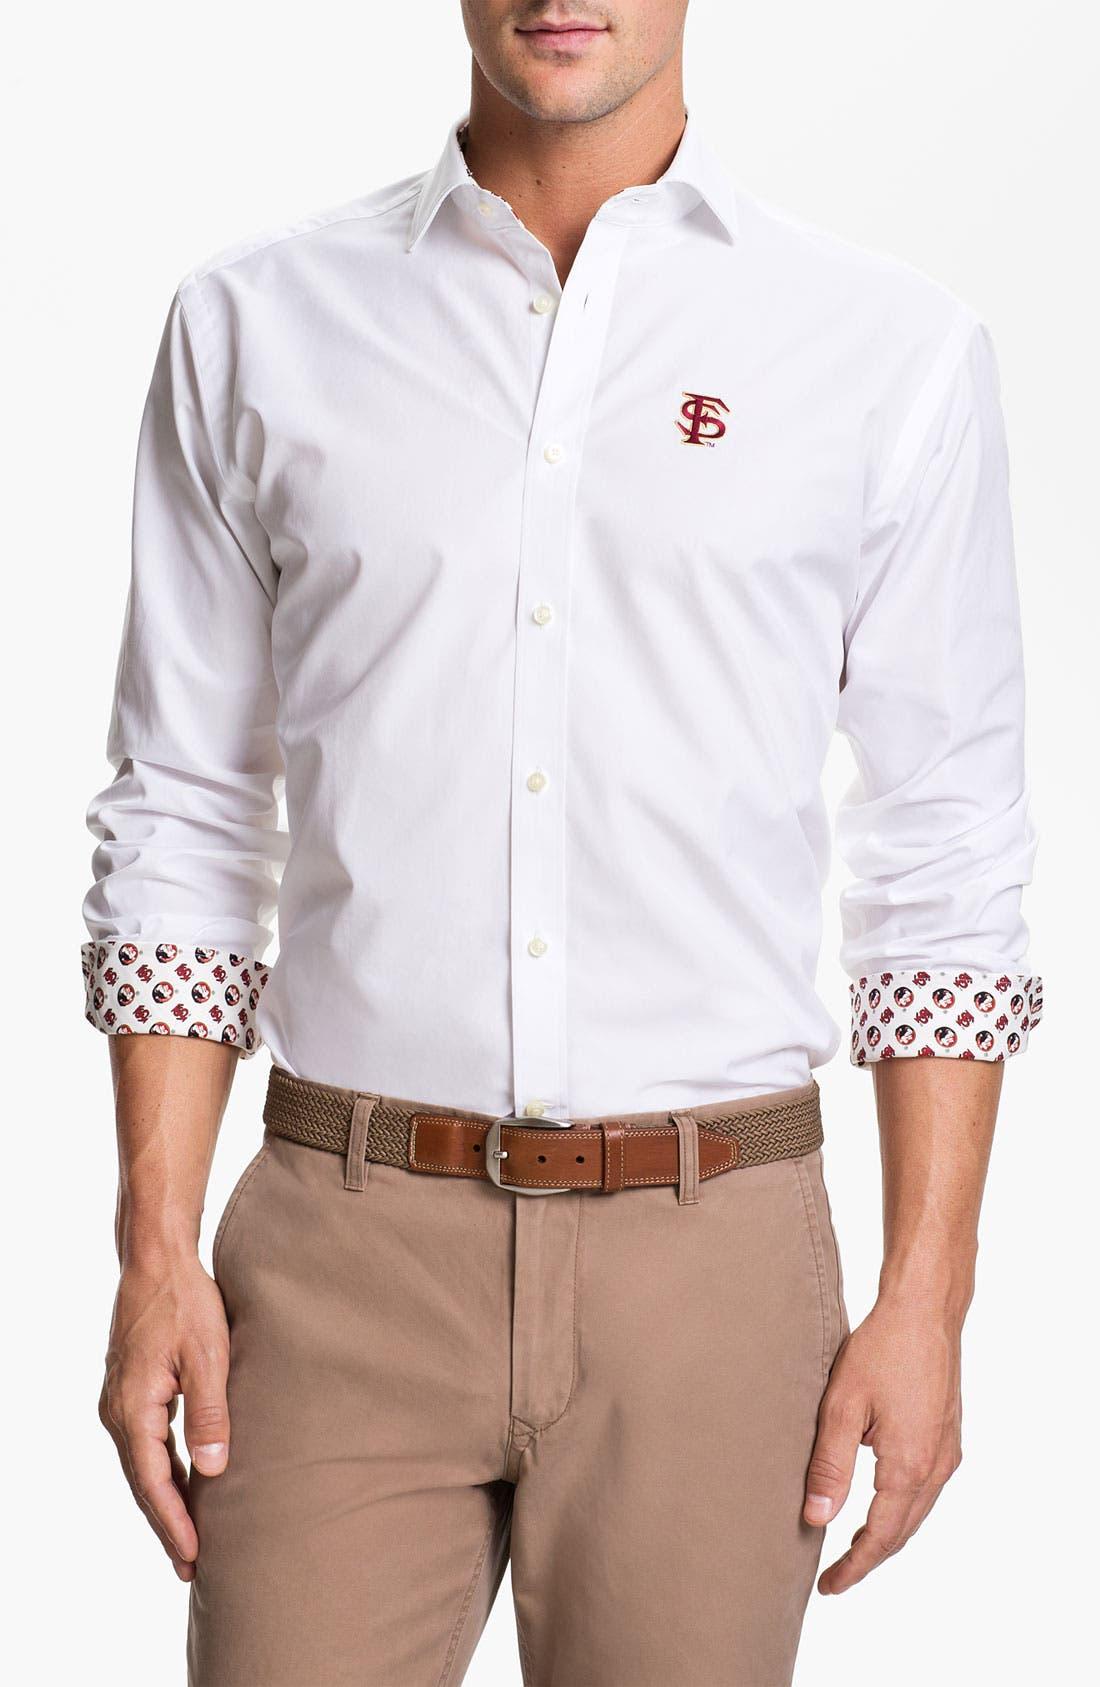 Alternate Image 1 Selected - Thomas Dean 'Florida State' Sport Shirt